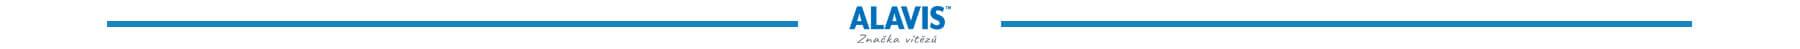 Alavis, logo, linka